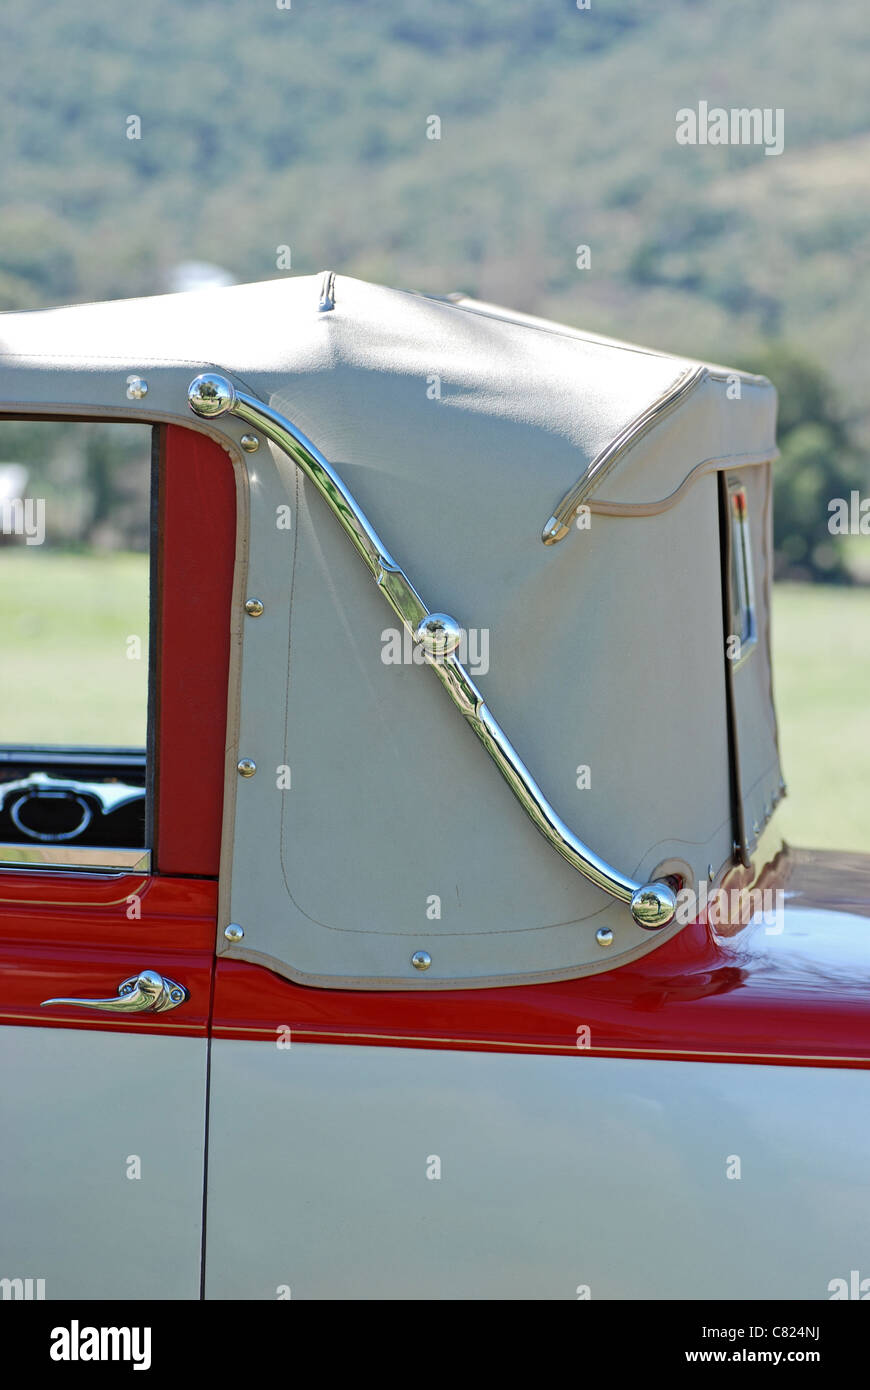 Detail of Hinge on vintage cabriolet automobile - Stock Image